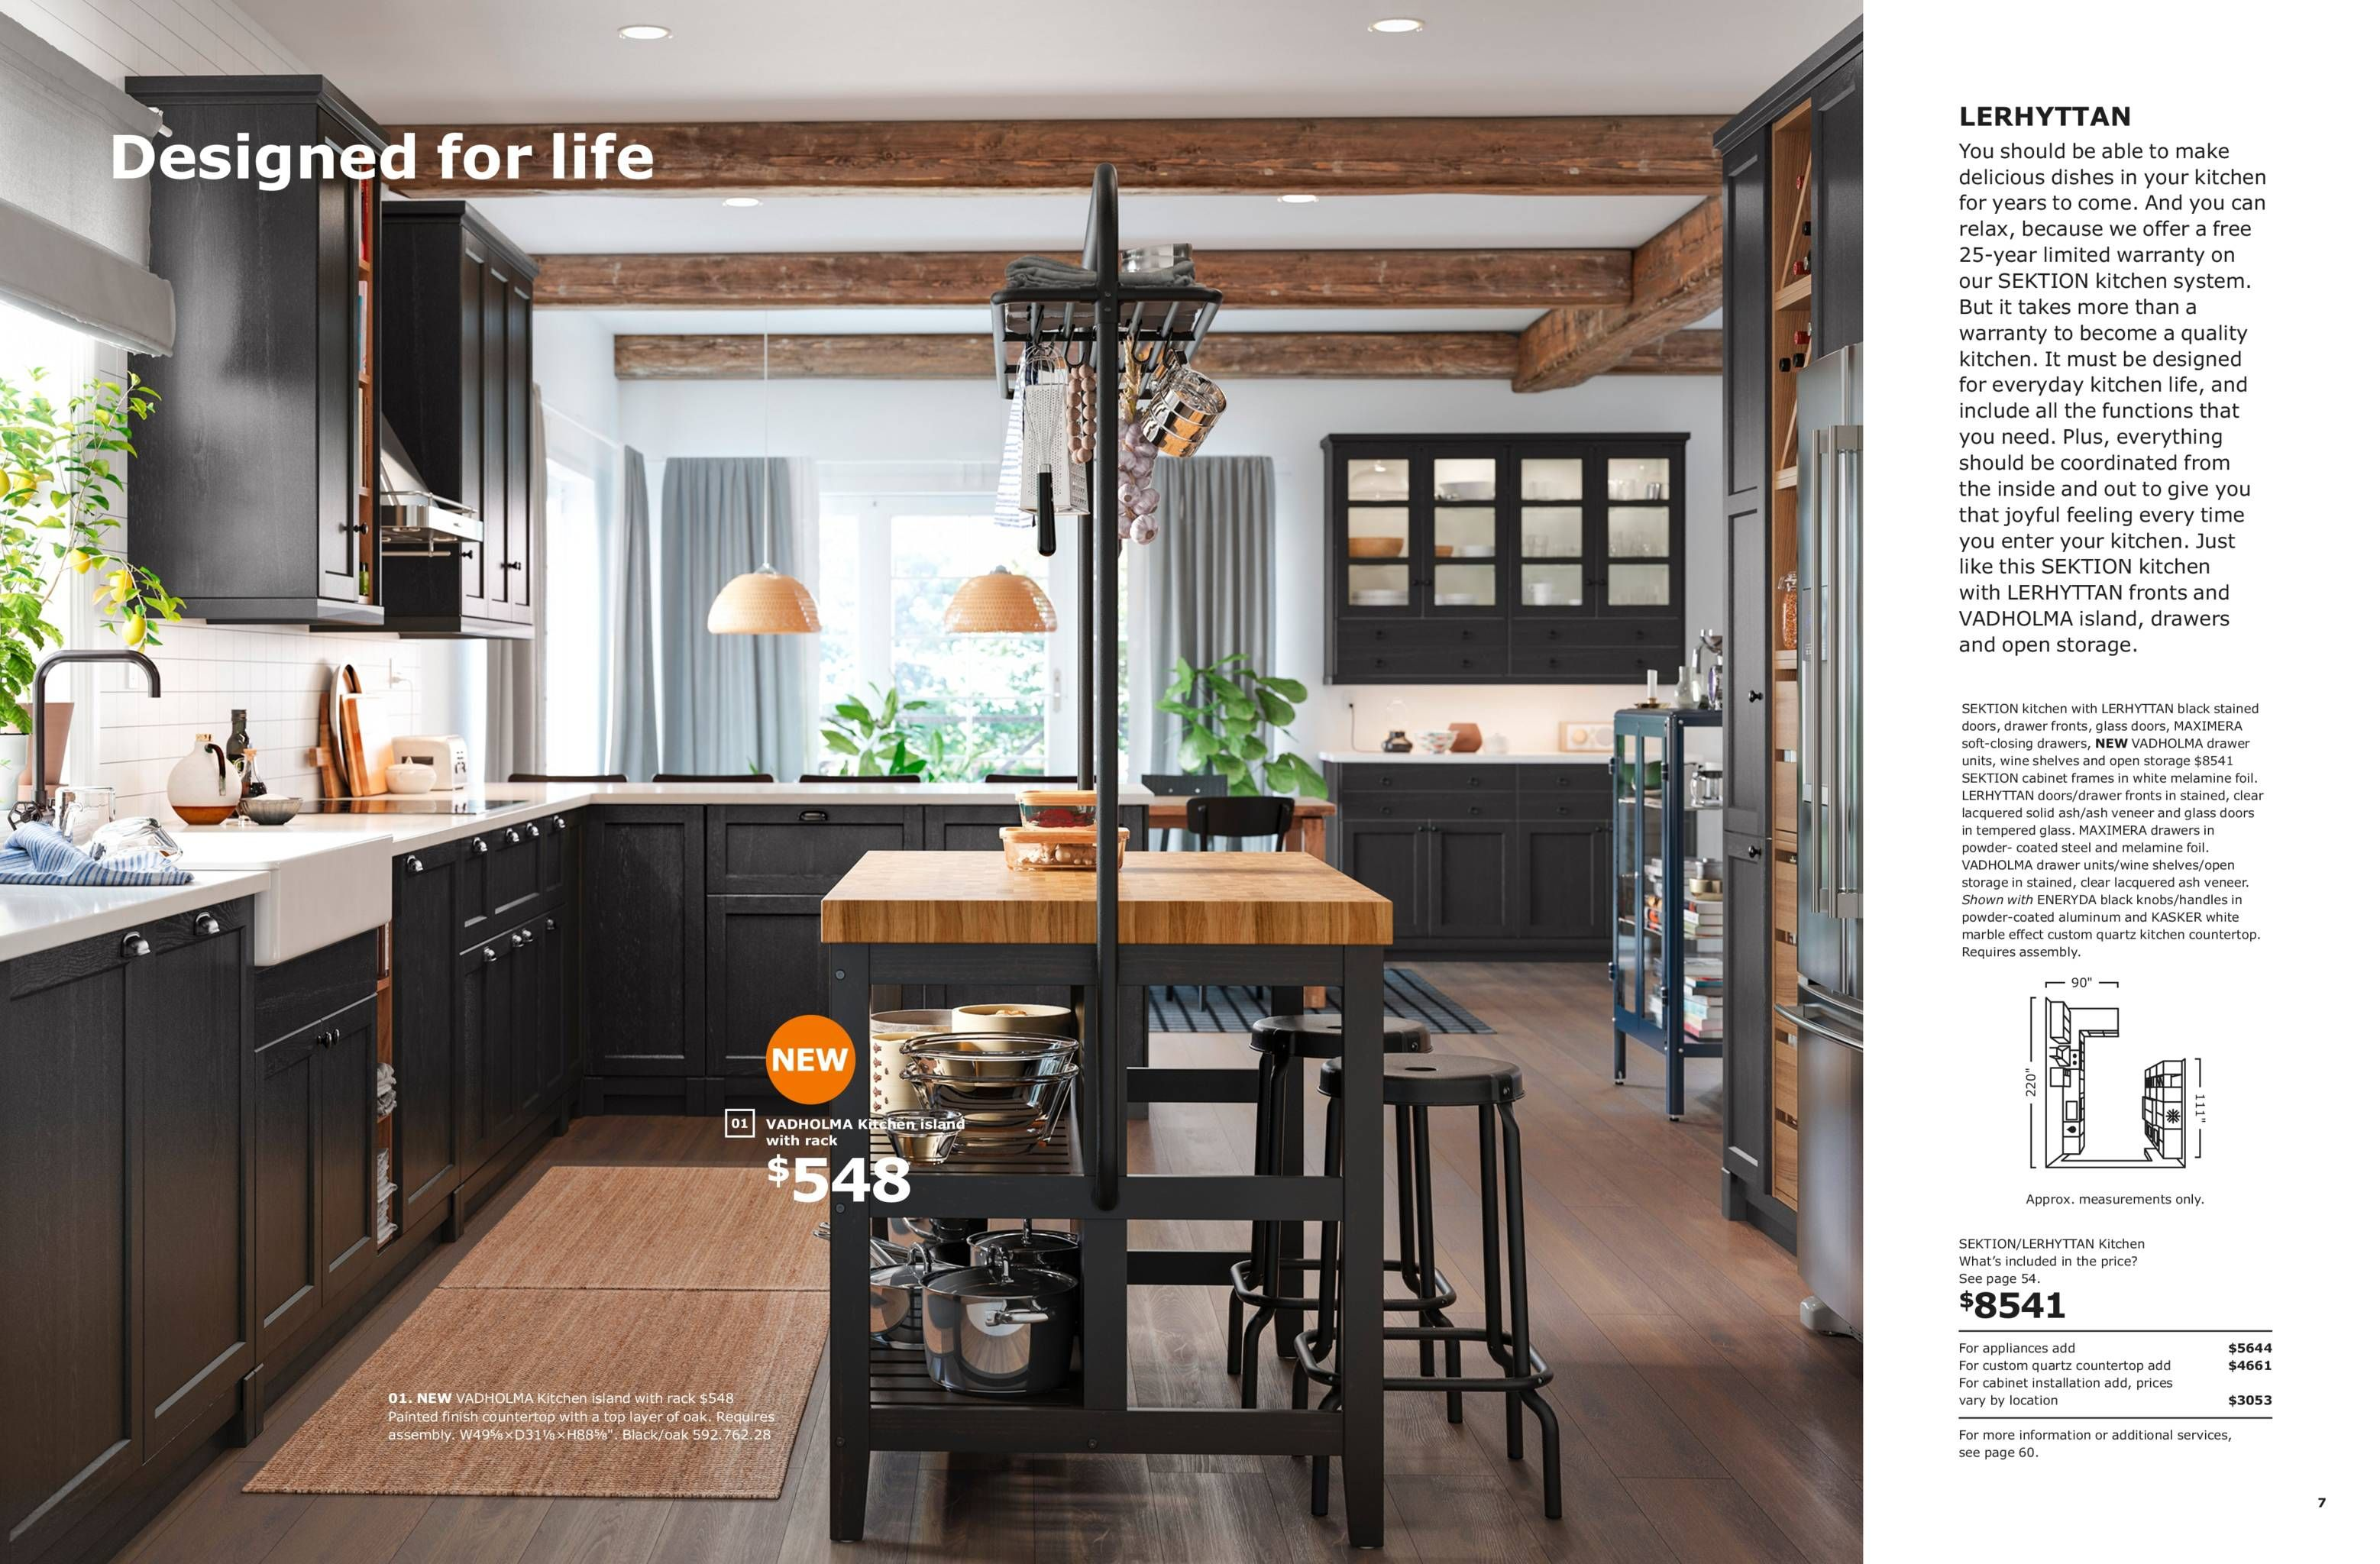 KITCHENS 2019 IKEA Kitchen Brochure 2019 Ikea 부엌, 부엌